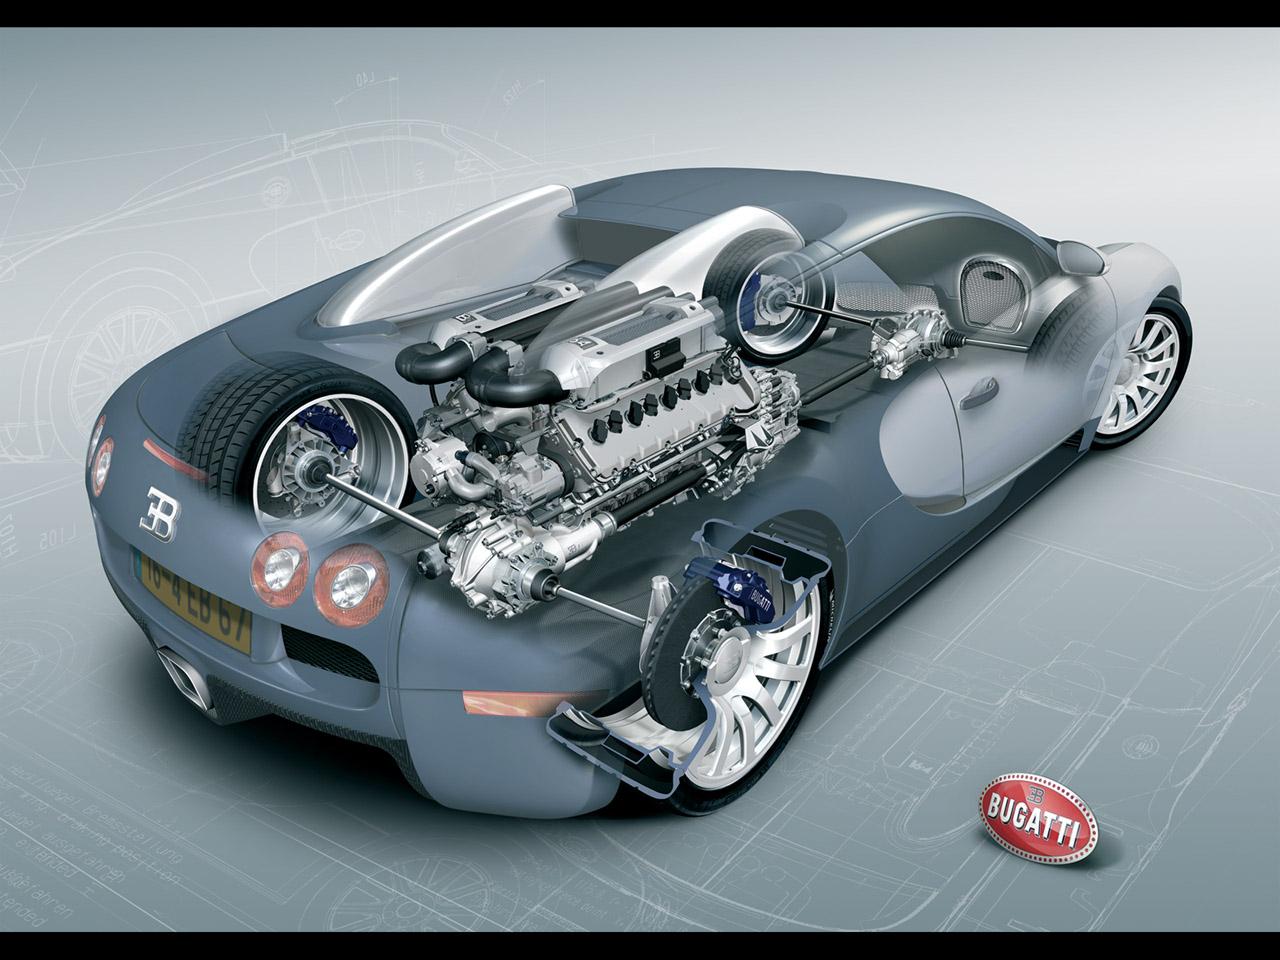 best car guide best car gallery bugatti veyron engine. Black Bedroom Furniture Sets. Home Design Ideas